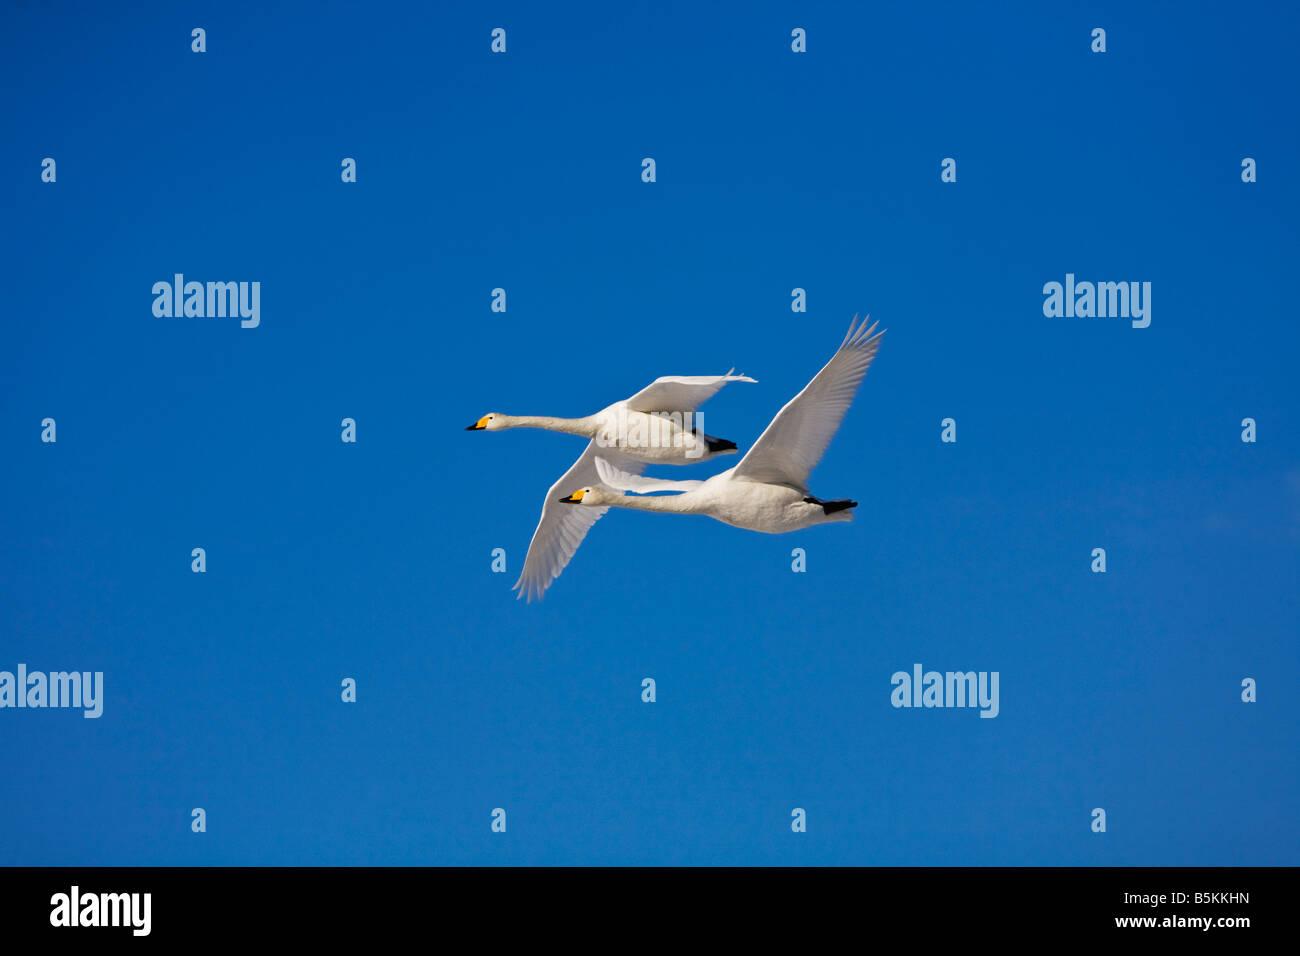 Hokkaido Japan Whooper Swans Cygnus cygnus flying in a blue sky Lake Kussharo Akan National Park - Stock Image